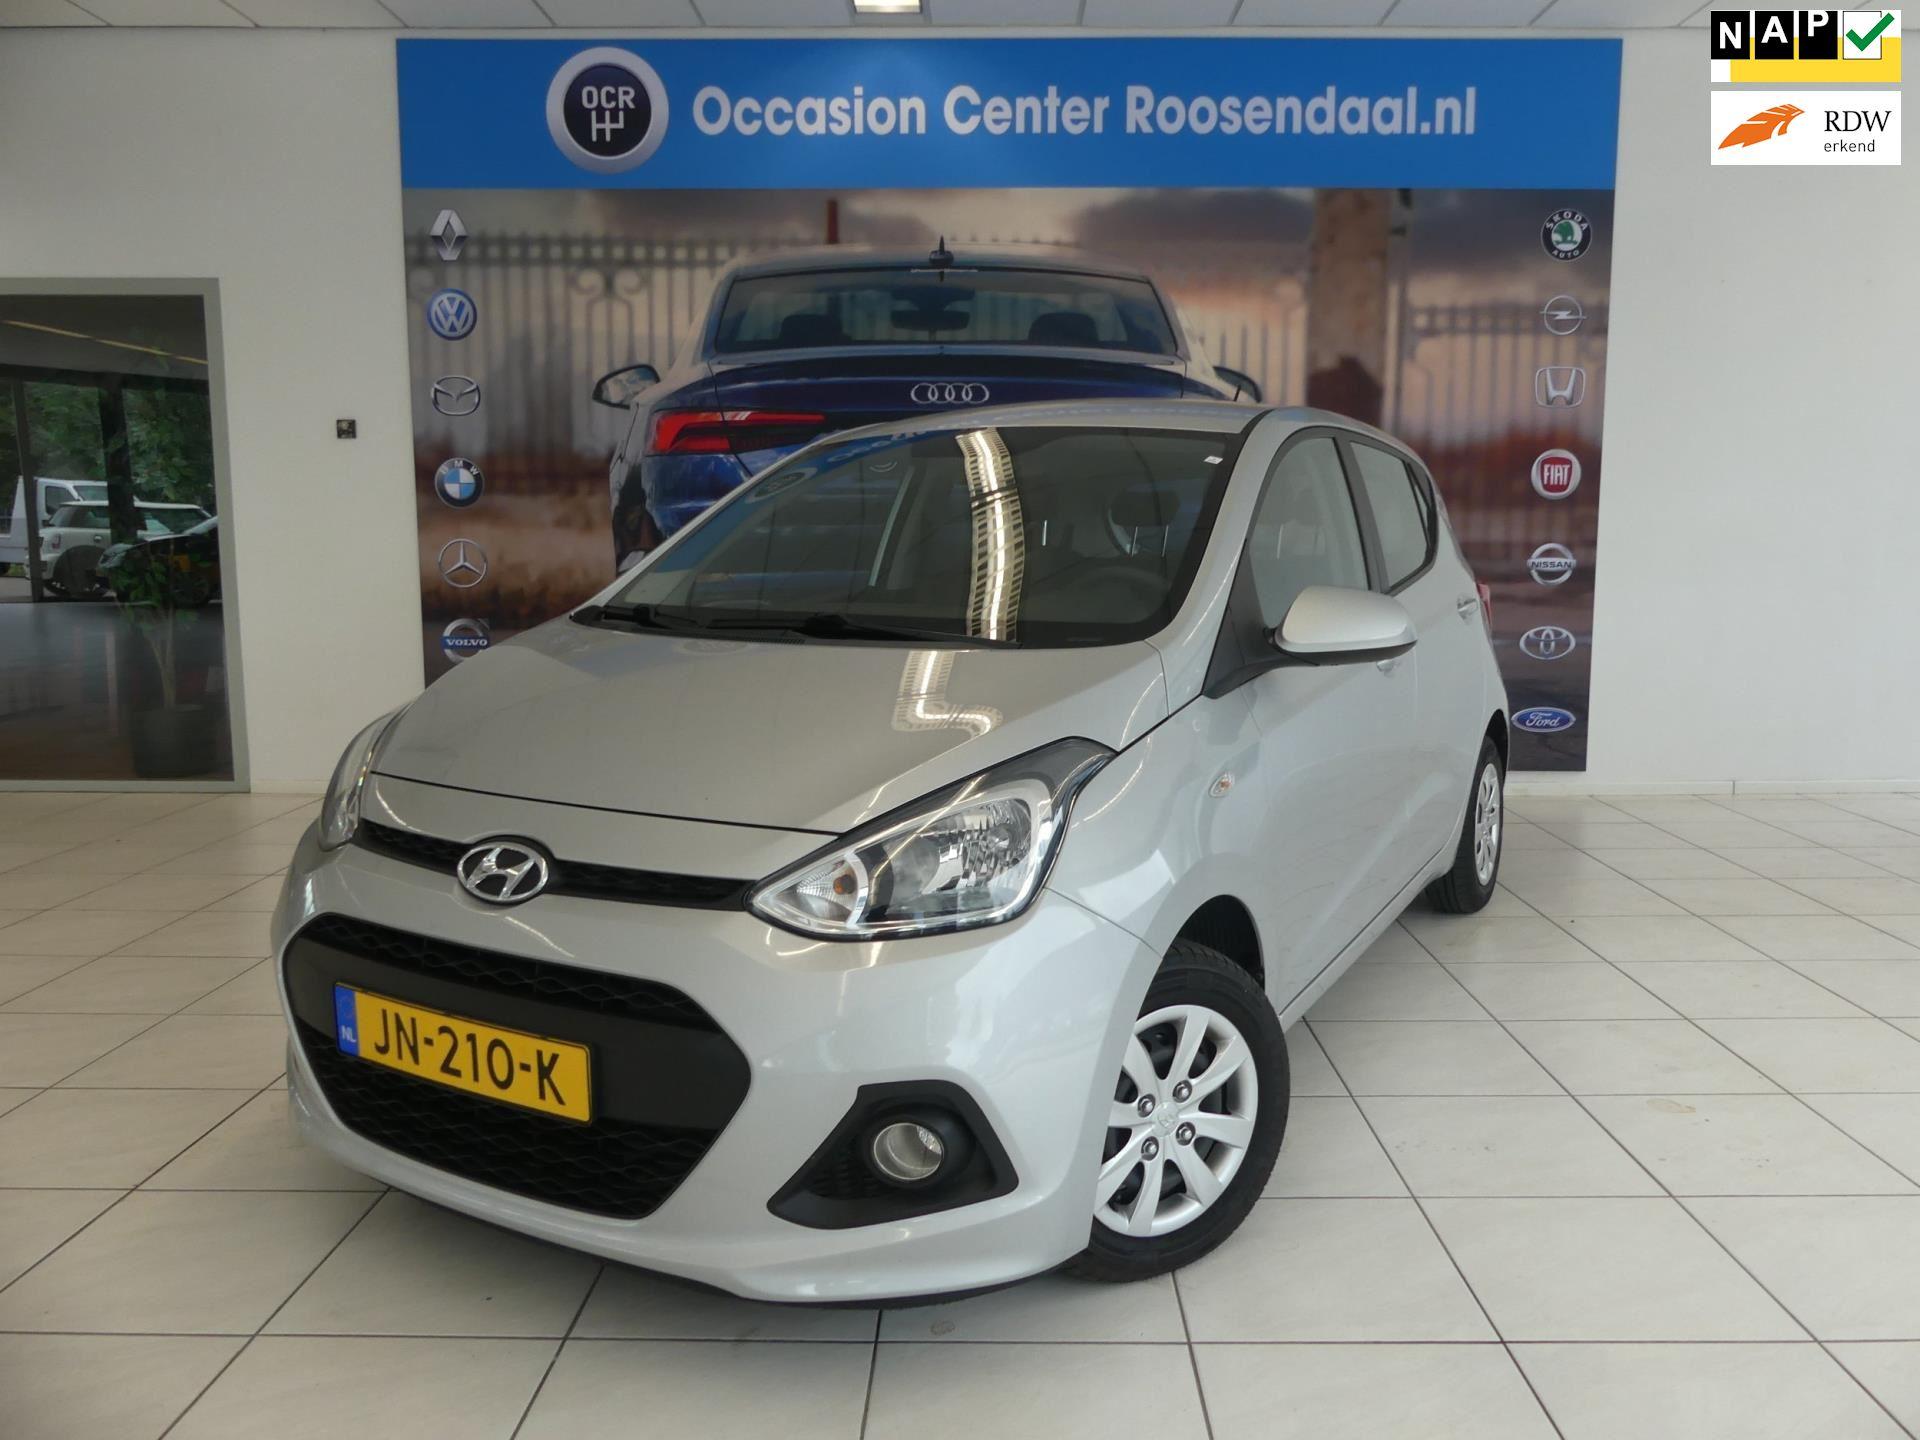 Hyundai I10 occasion - Occasion Center Roosendaal